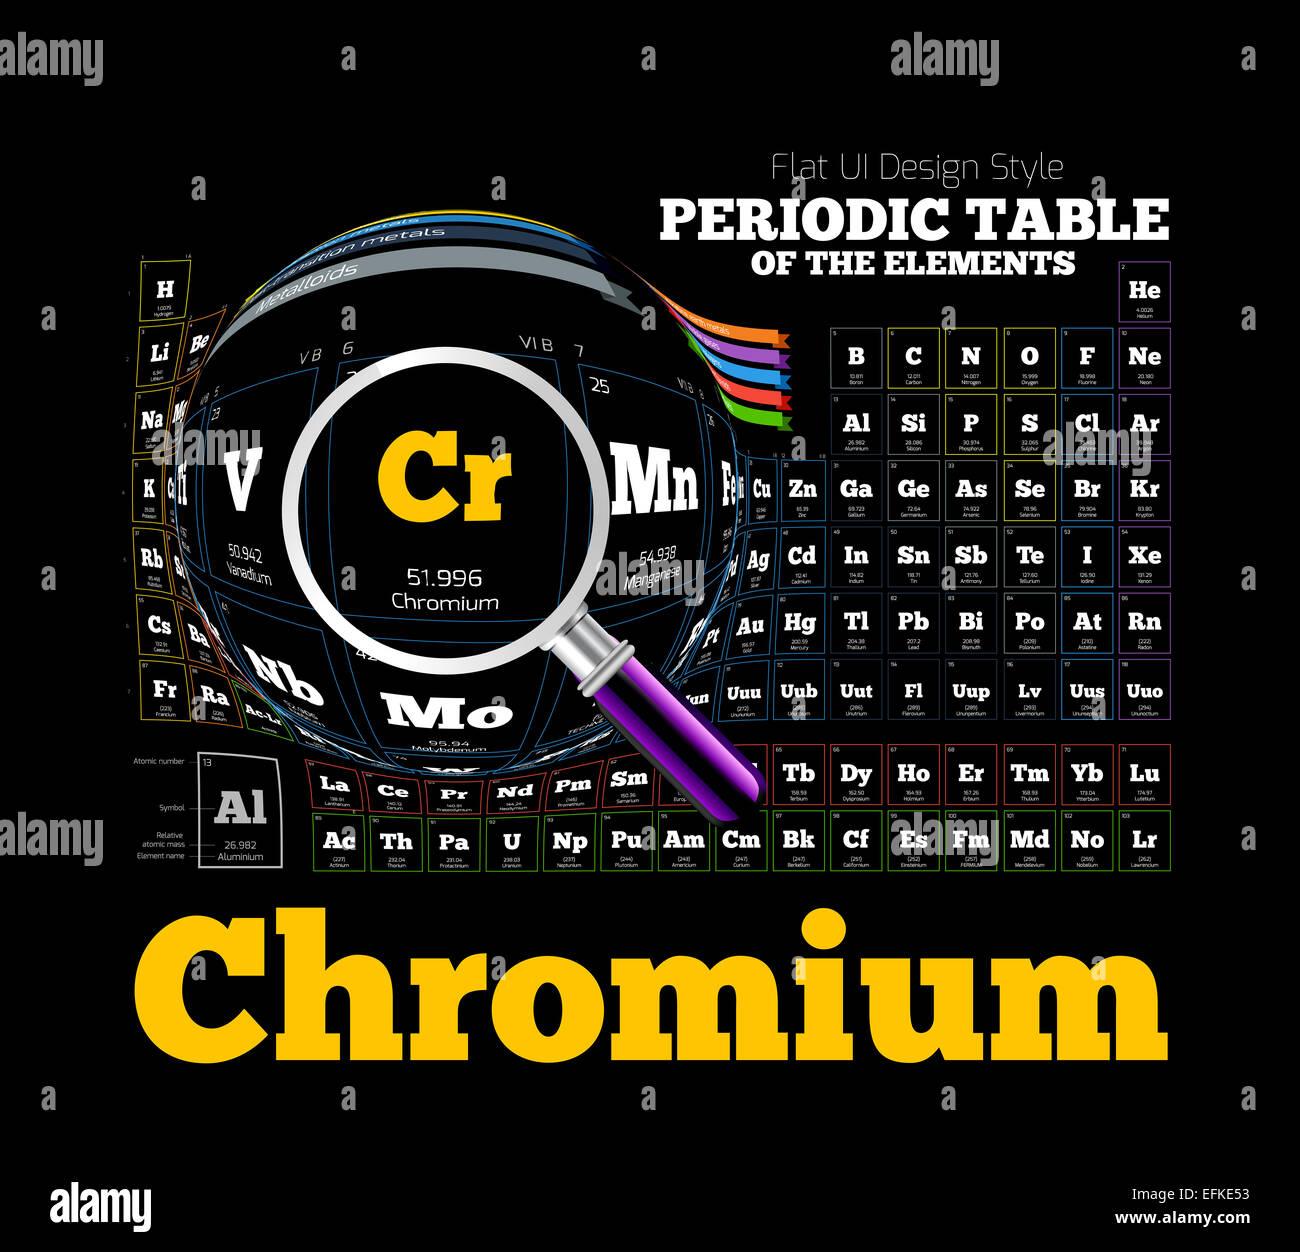 Periodic Table Of The Element Chromium Cr Stock Photo 78489519